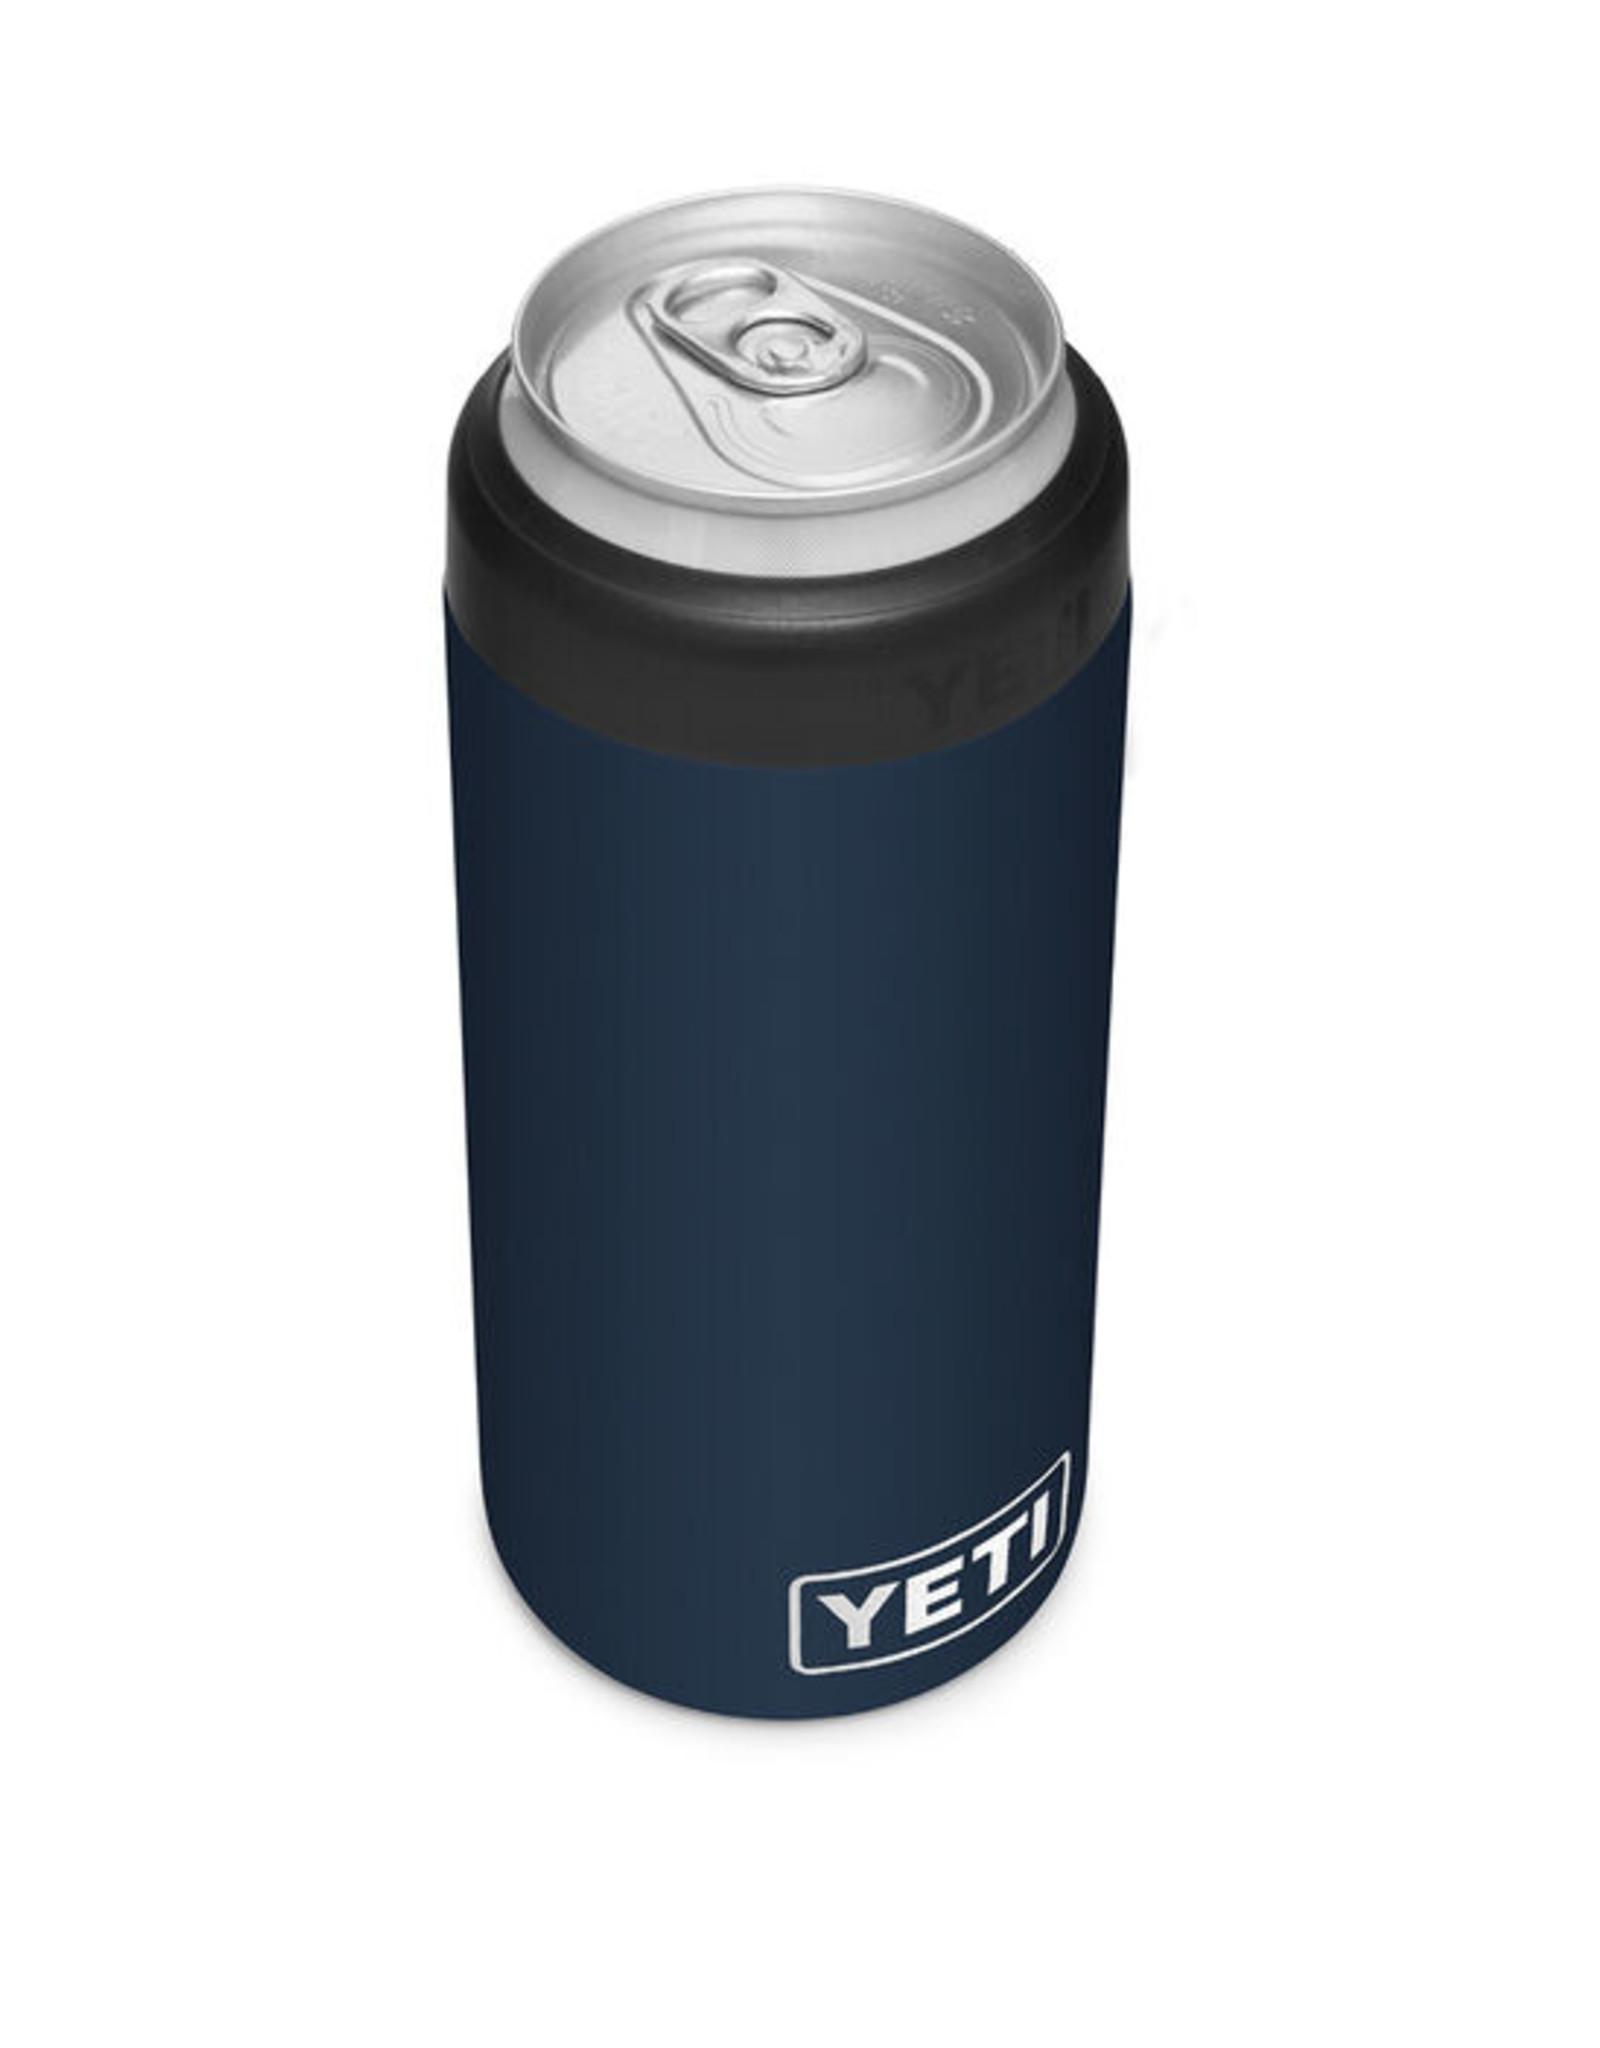 YETI Coolers Colster Slim-Navy